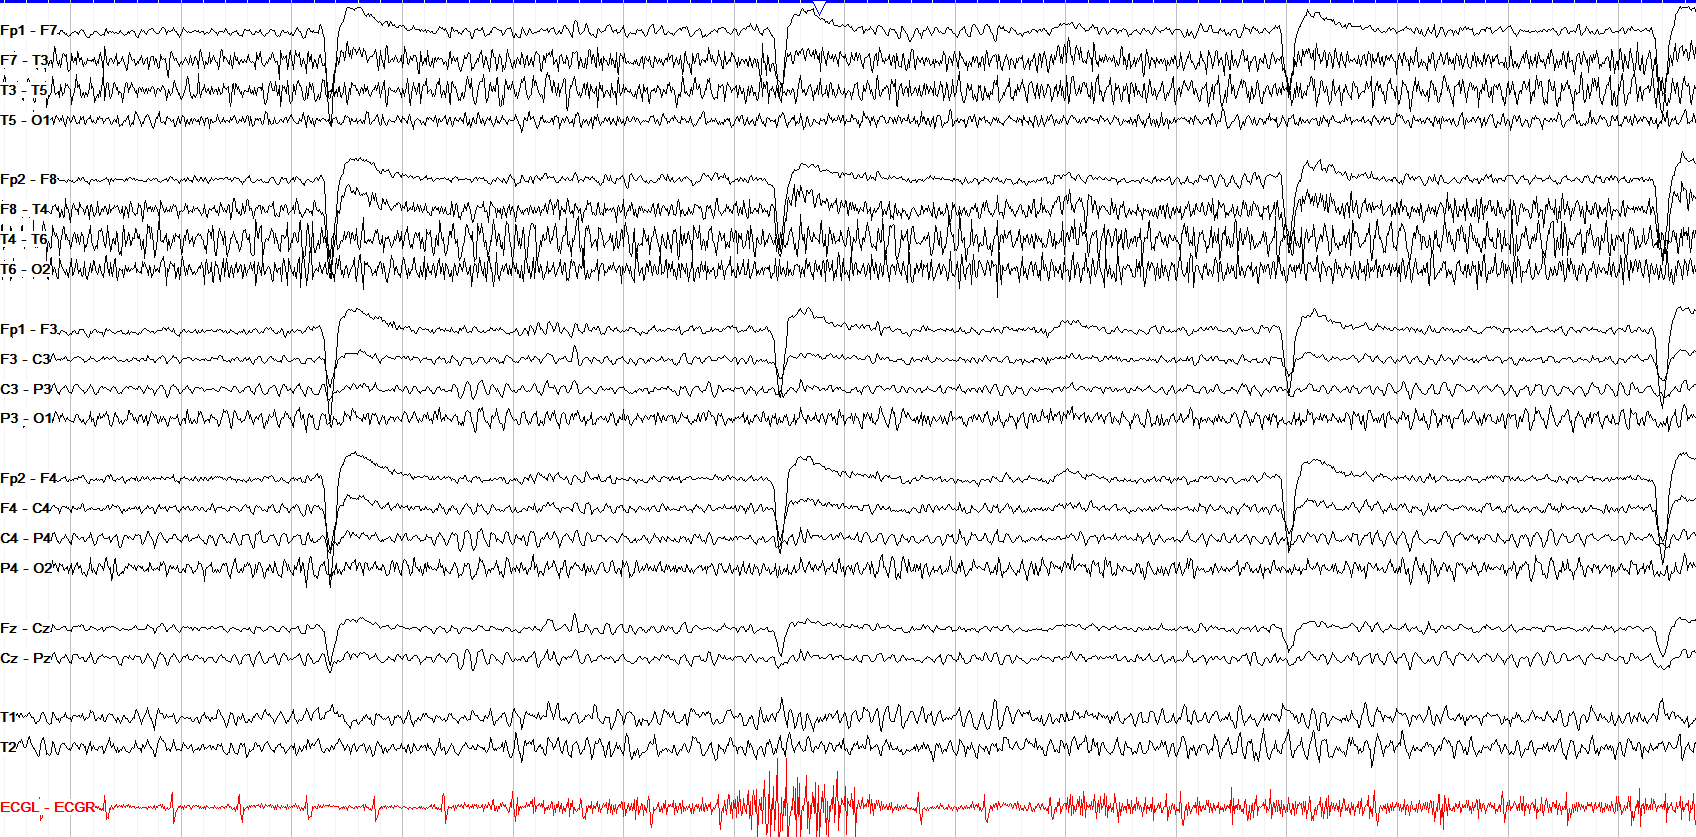 photic driving 6 Hz